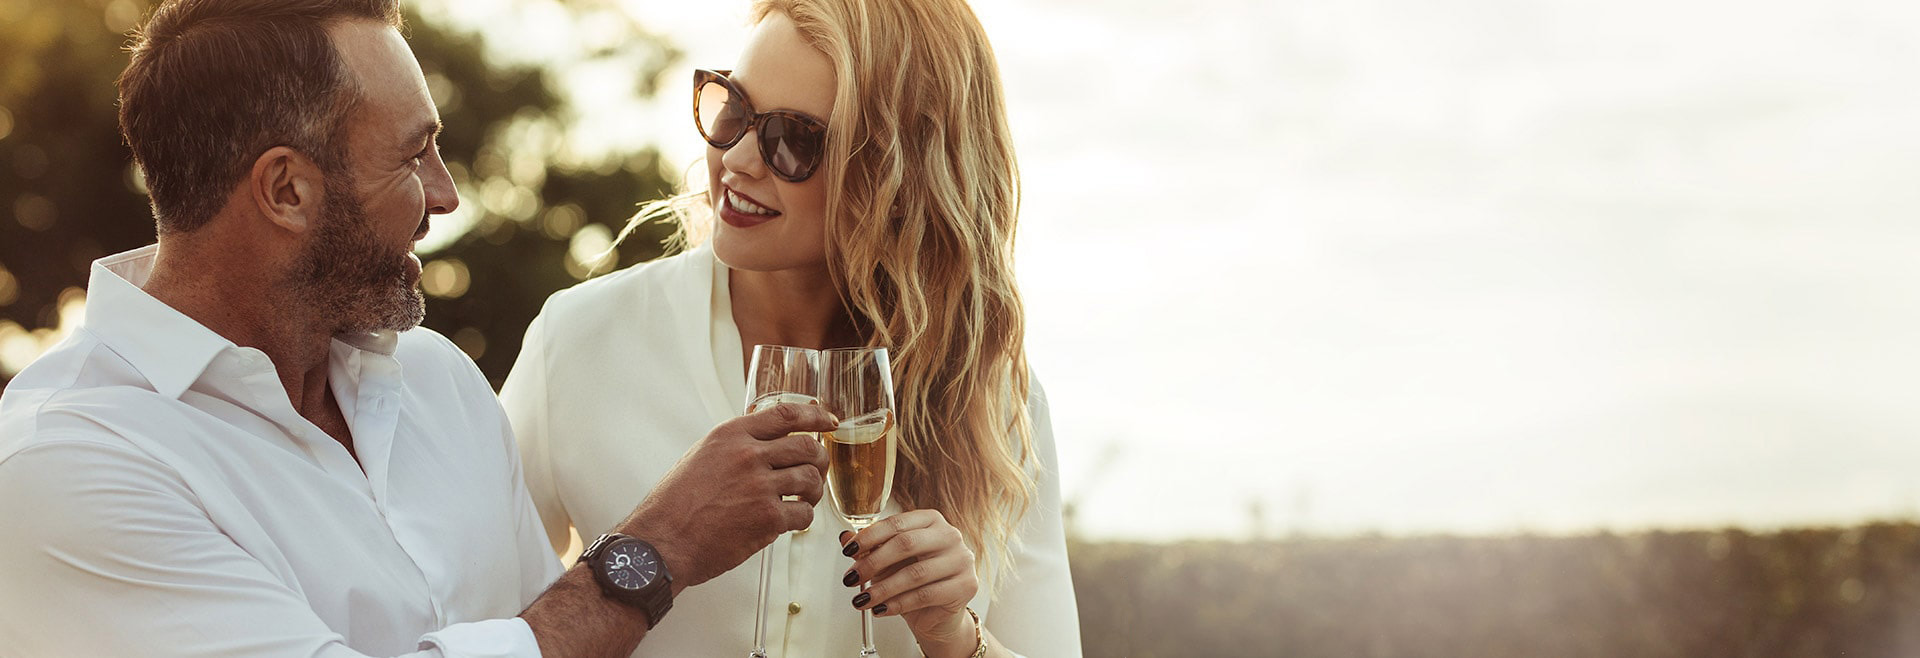 Couple holding champagne flutes enjoying seaside living at The Residences at The St. Regis Longboat Key Resort